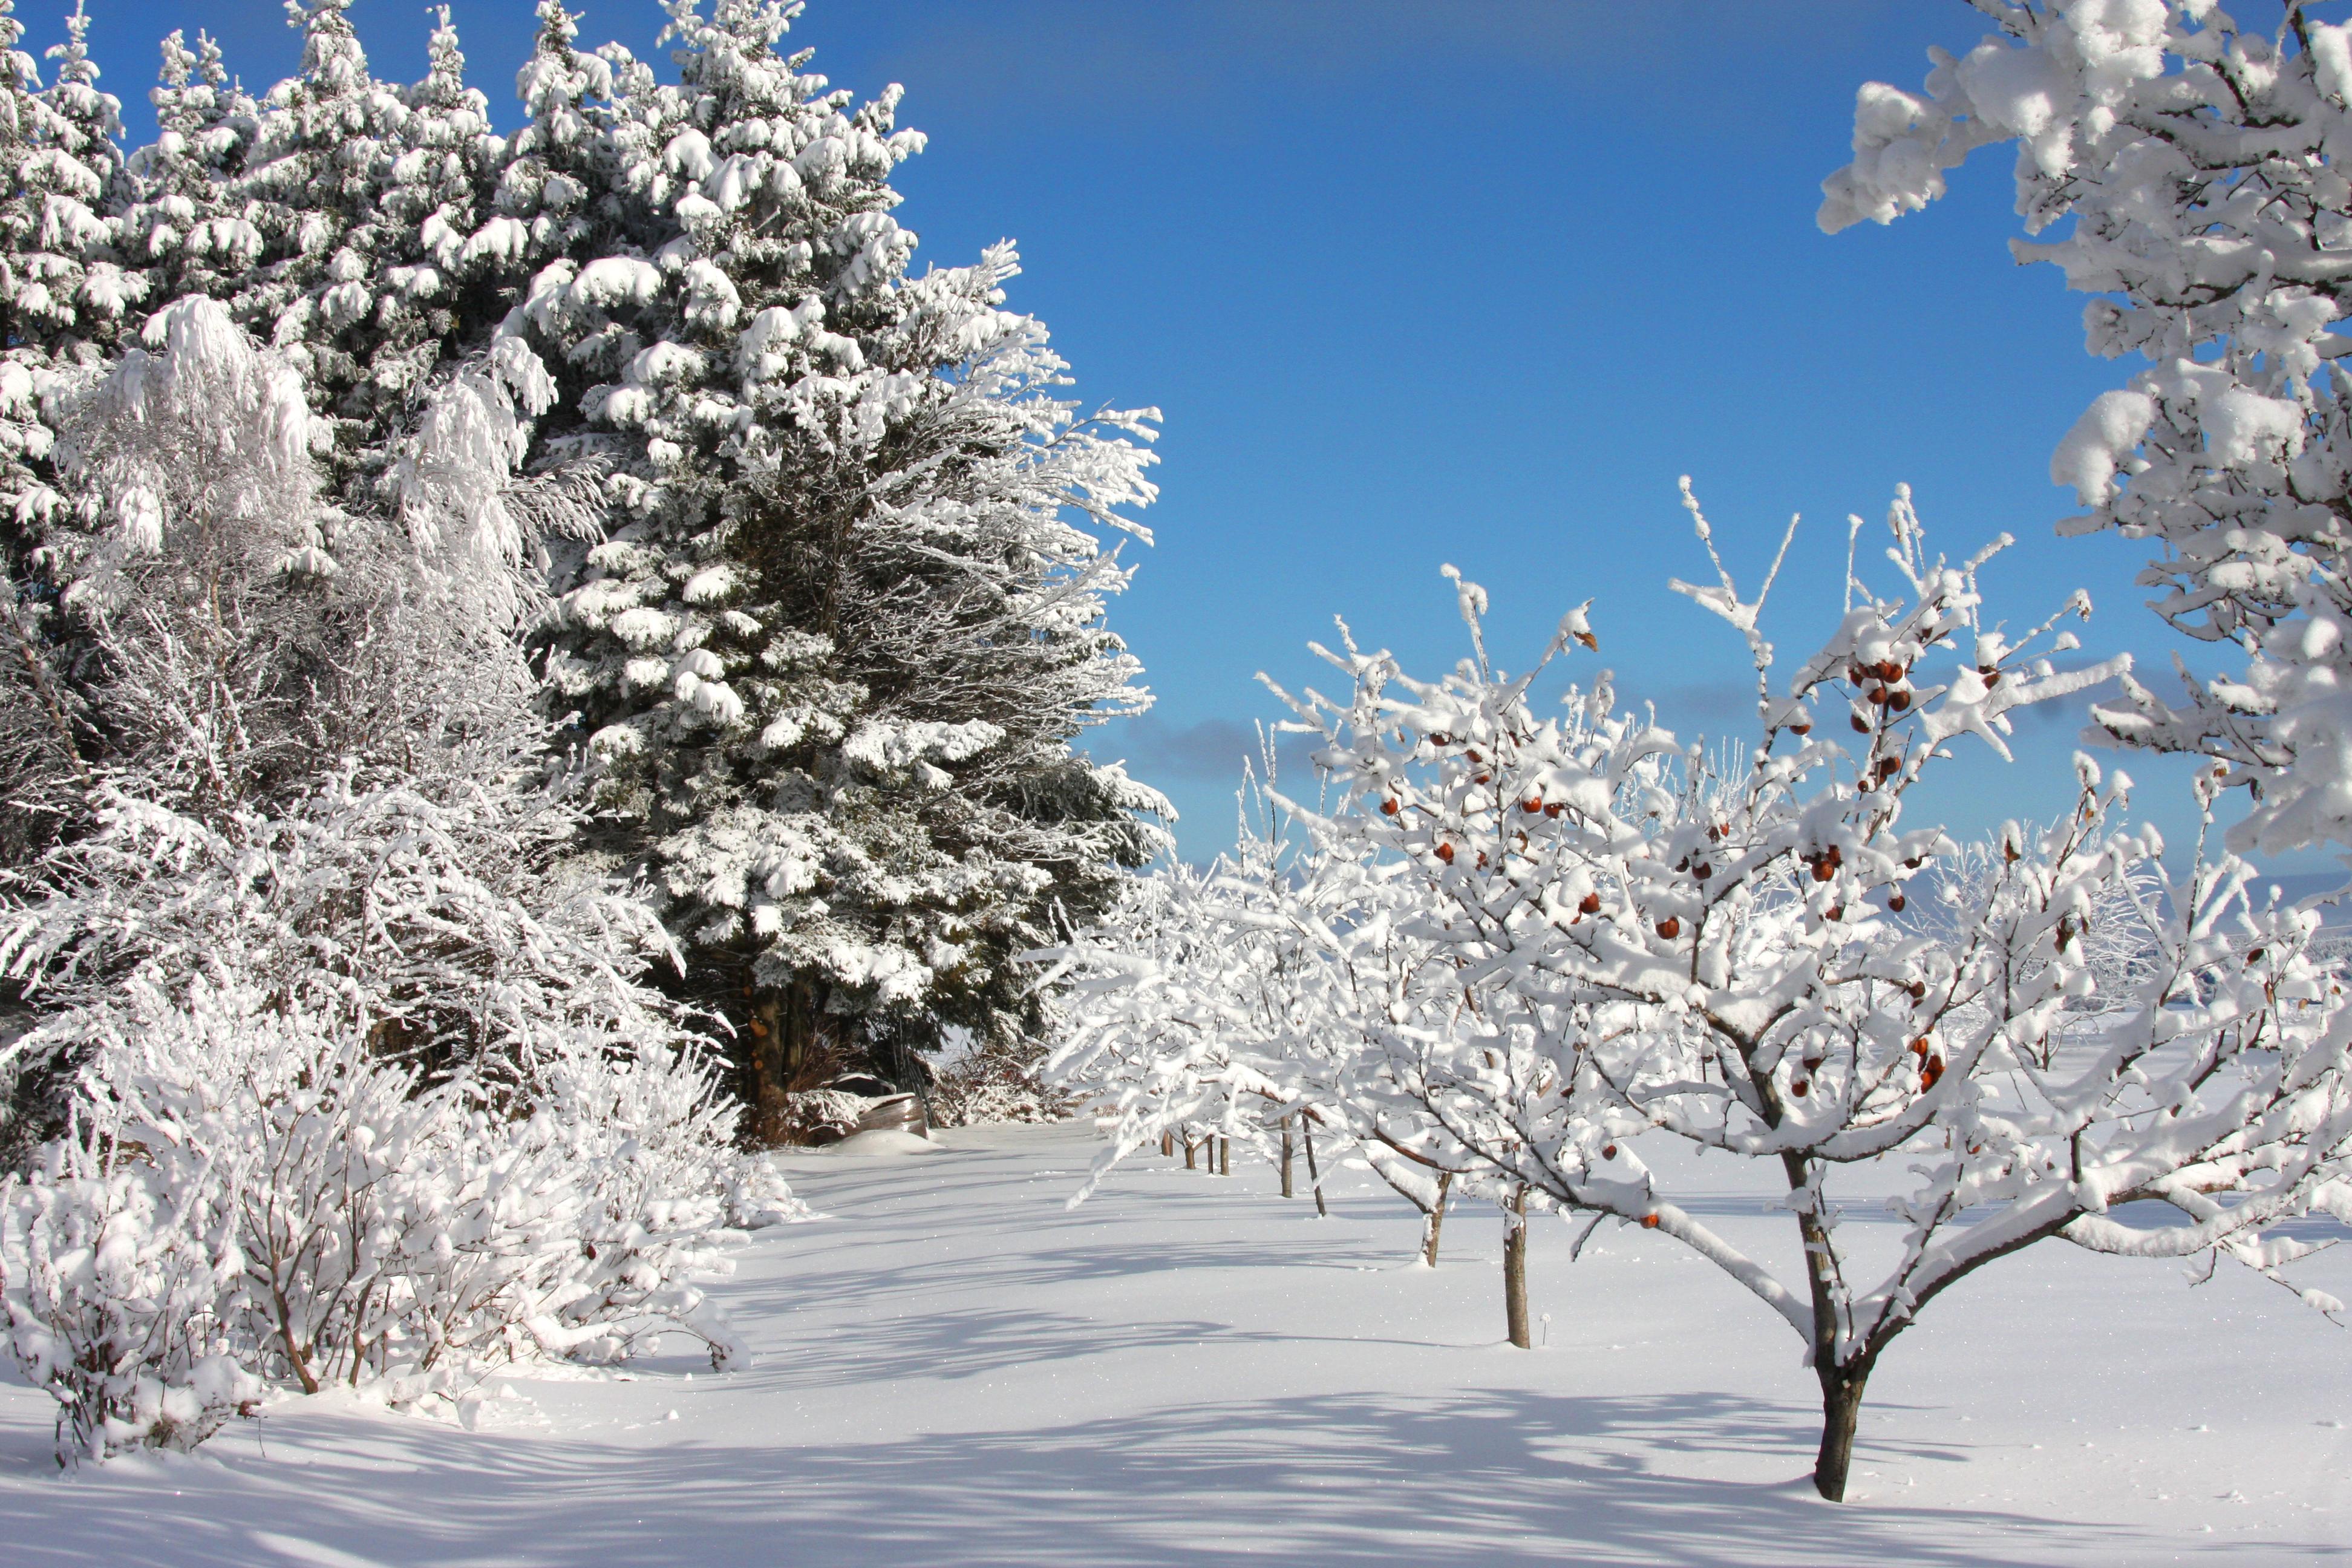 Paysage hiver fashion designs for Paysage design